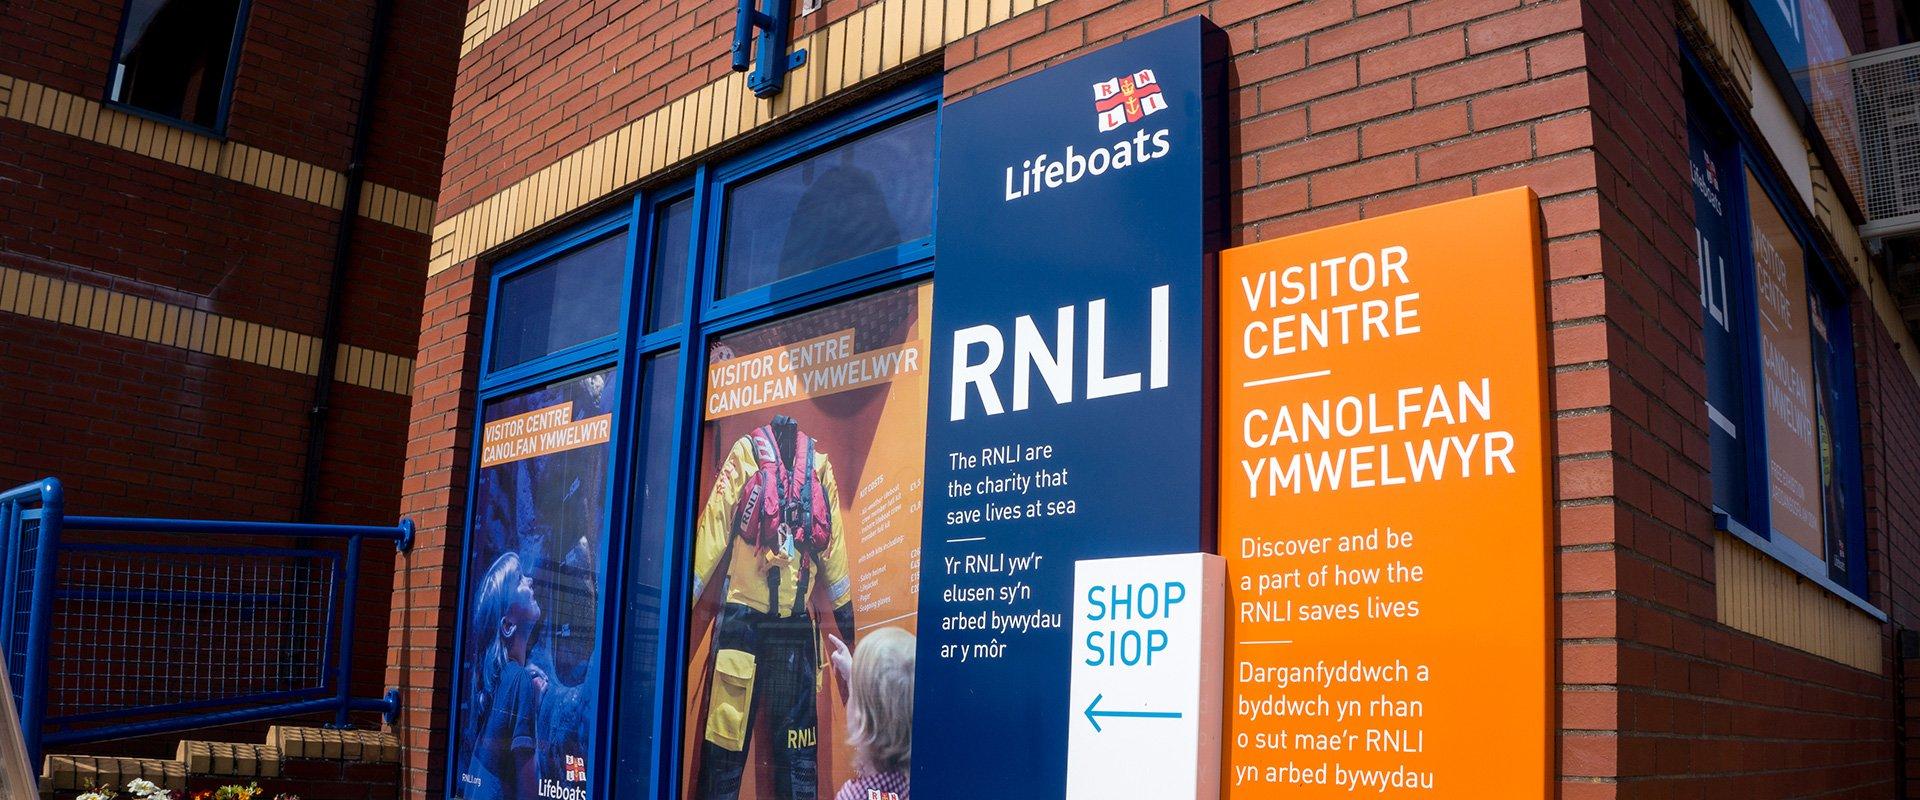 RNLI Barry Island Visitor Centre building signage branding